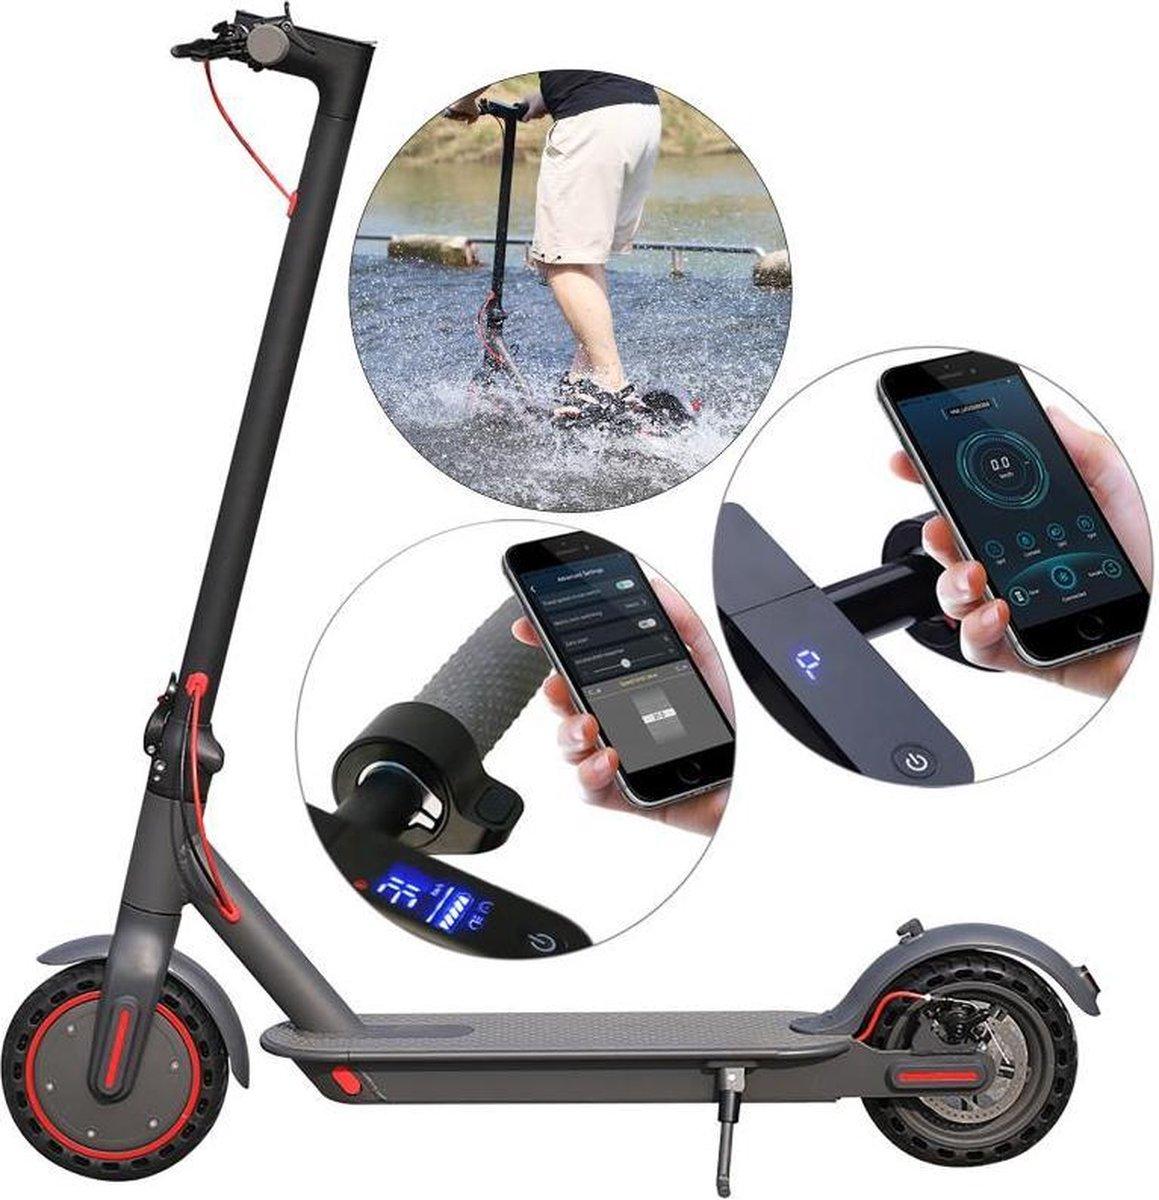 Merkloos / Sans marque Elektrische step -32km/u 40+km bereik- Bluetooth App Cruise control LED verlichting Opvouwbaar online kopen